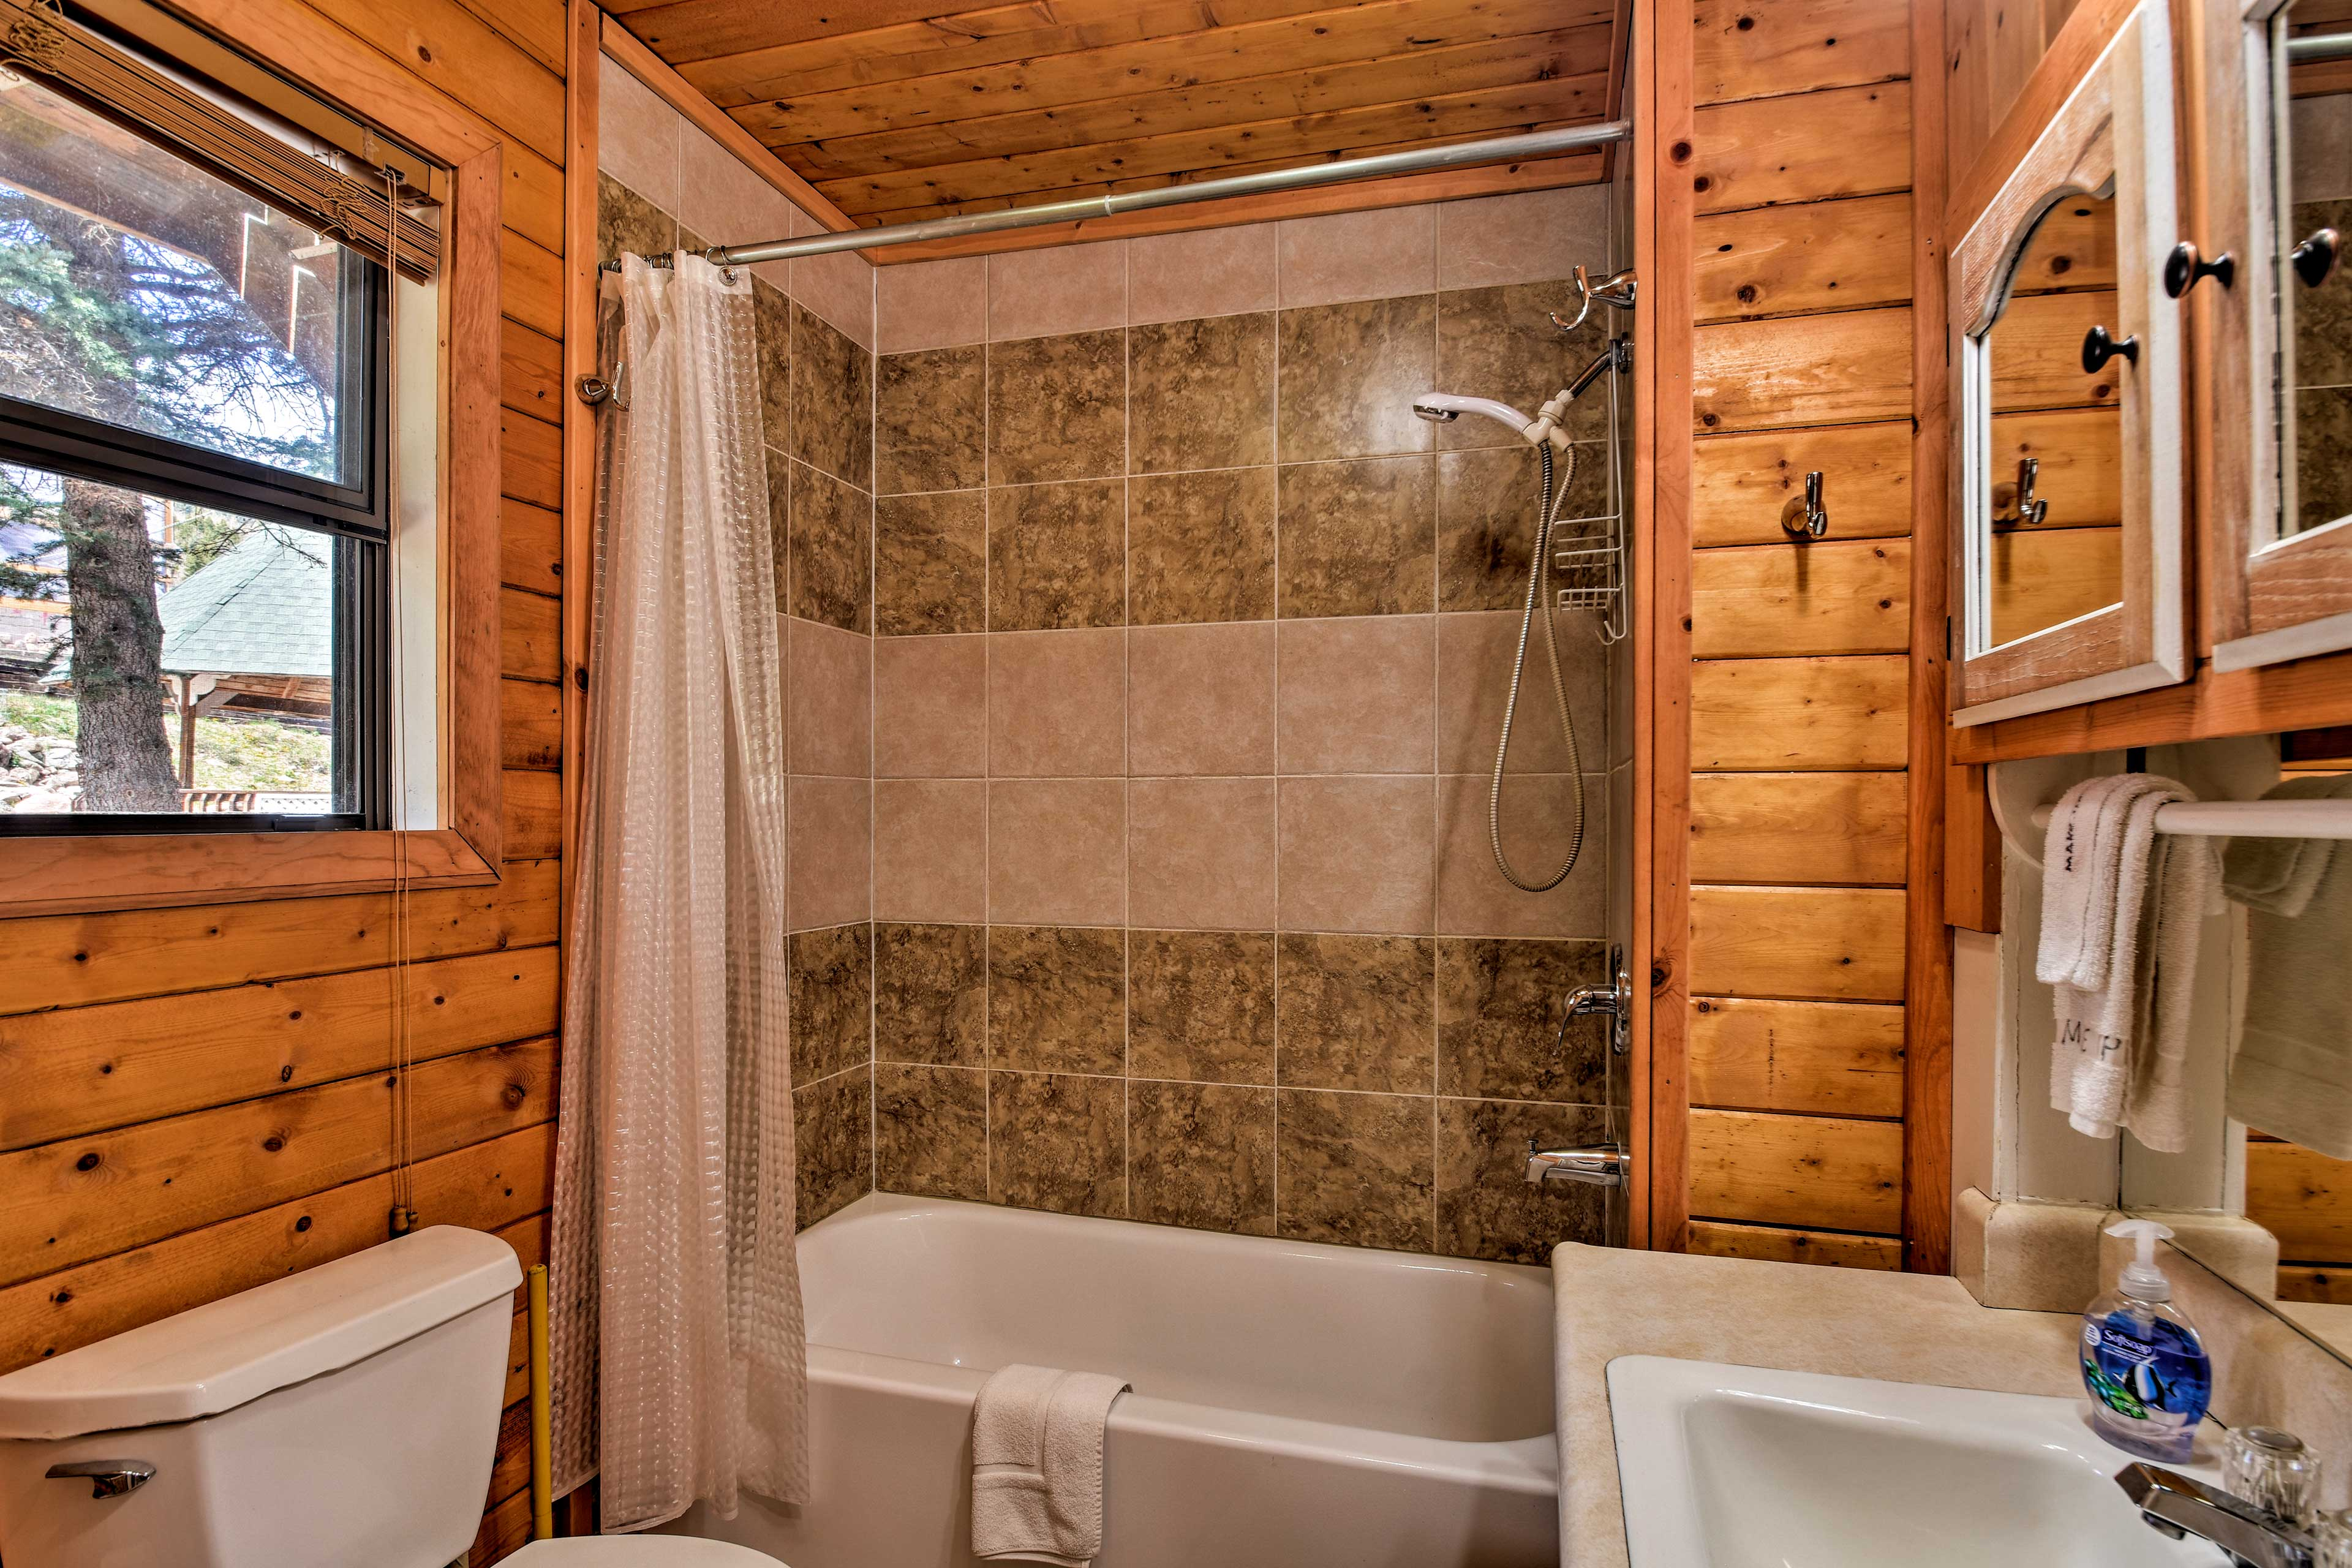 Take a quick shower or a long bath.